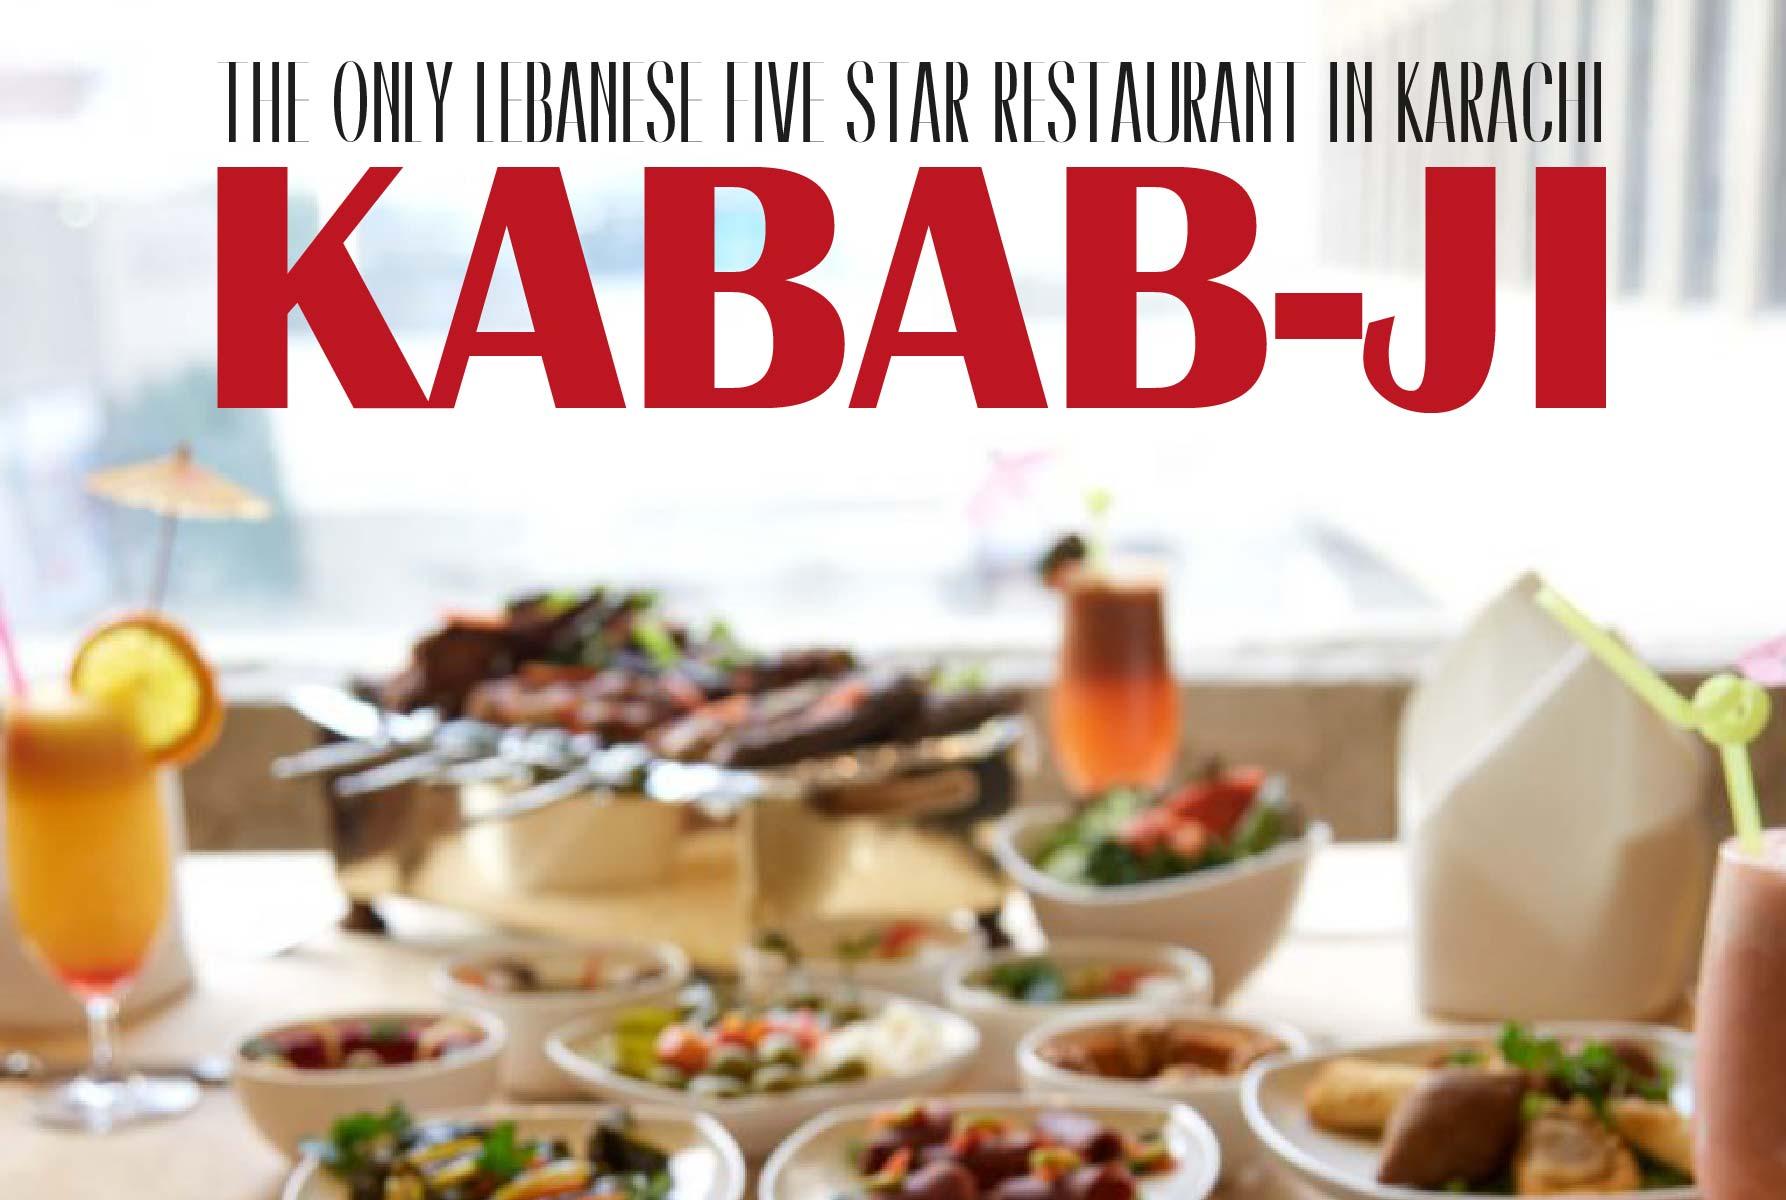 Kabab-JI Review